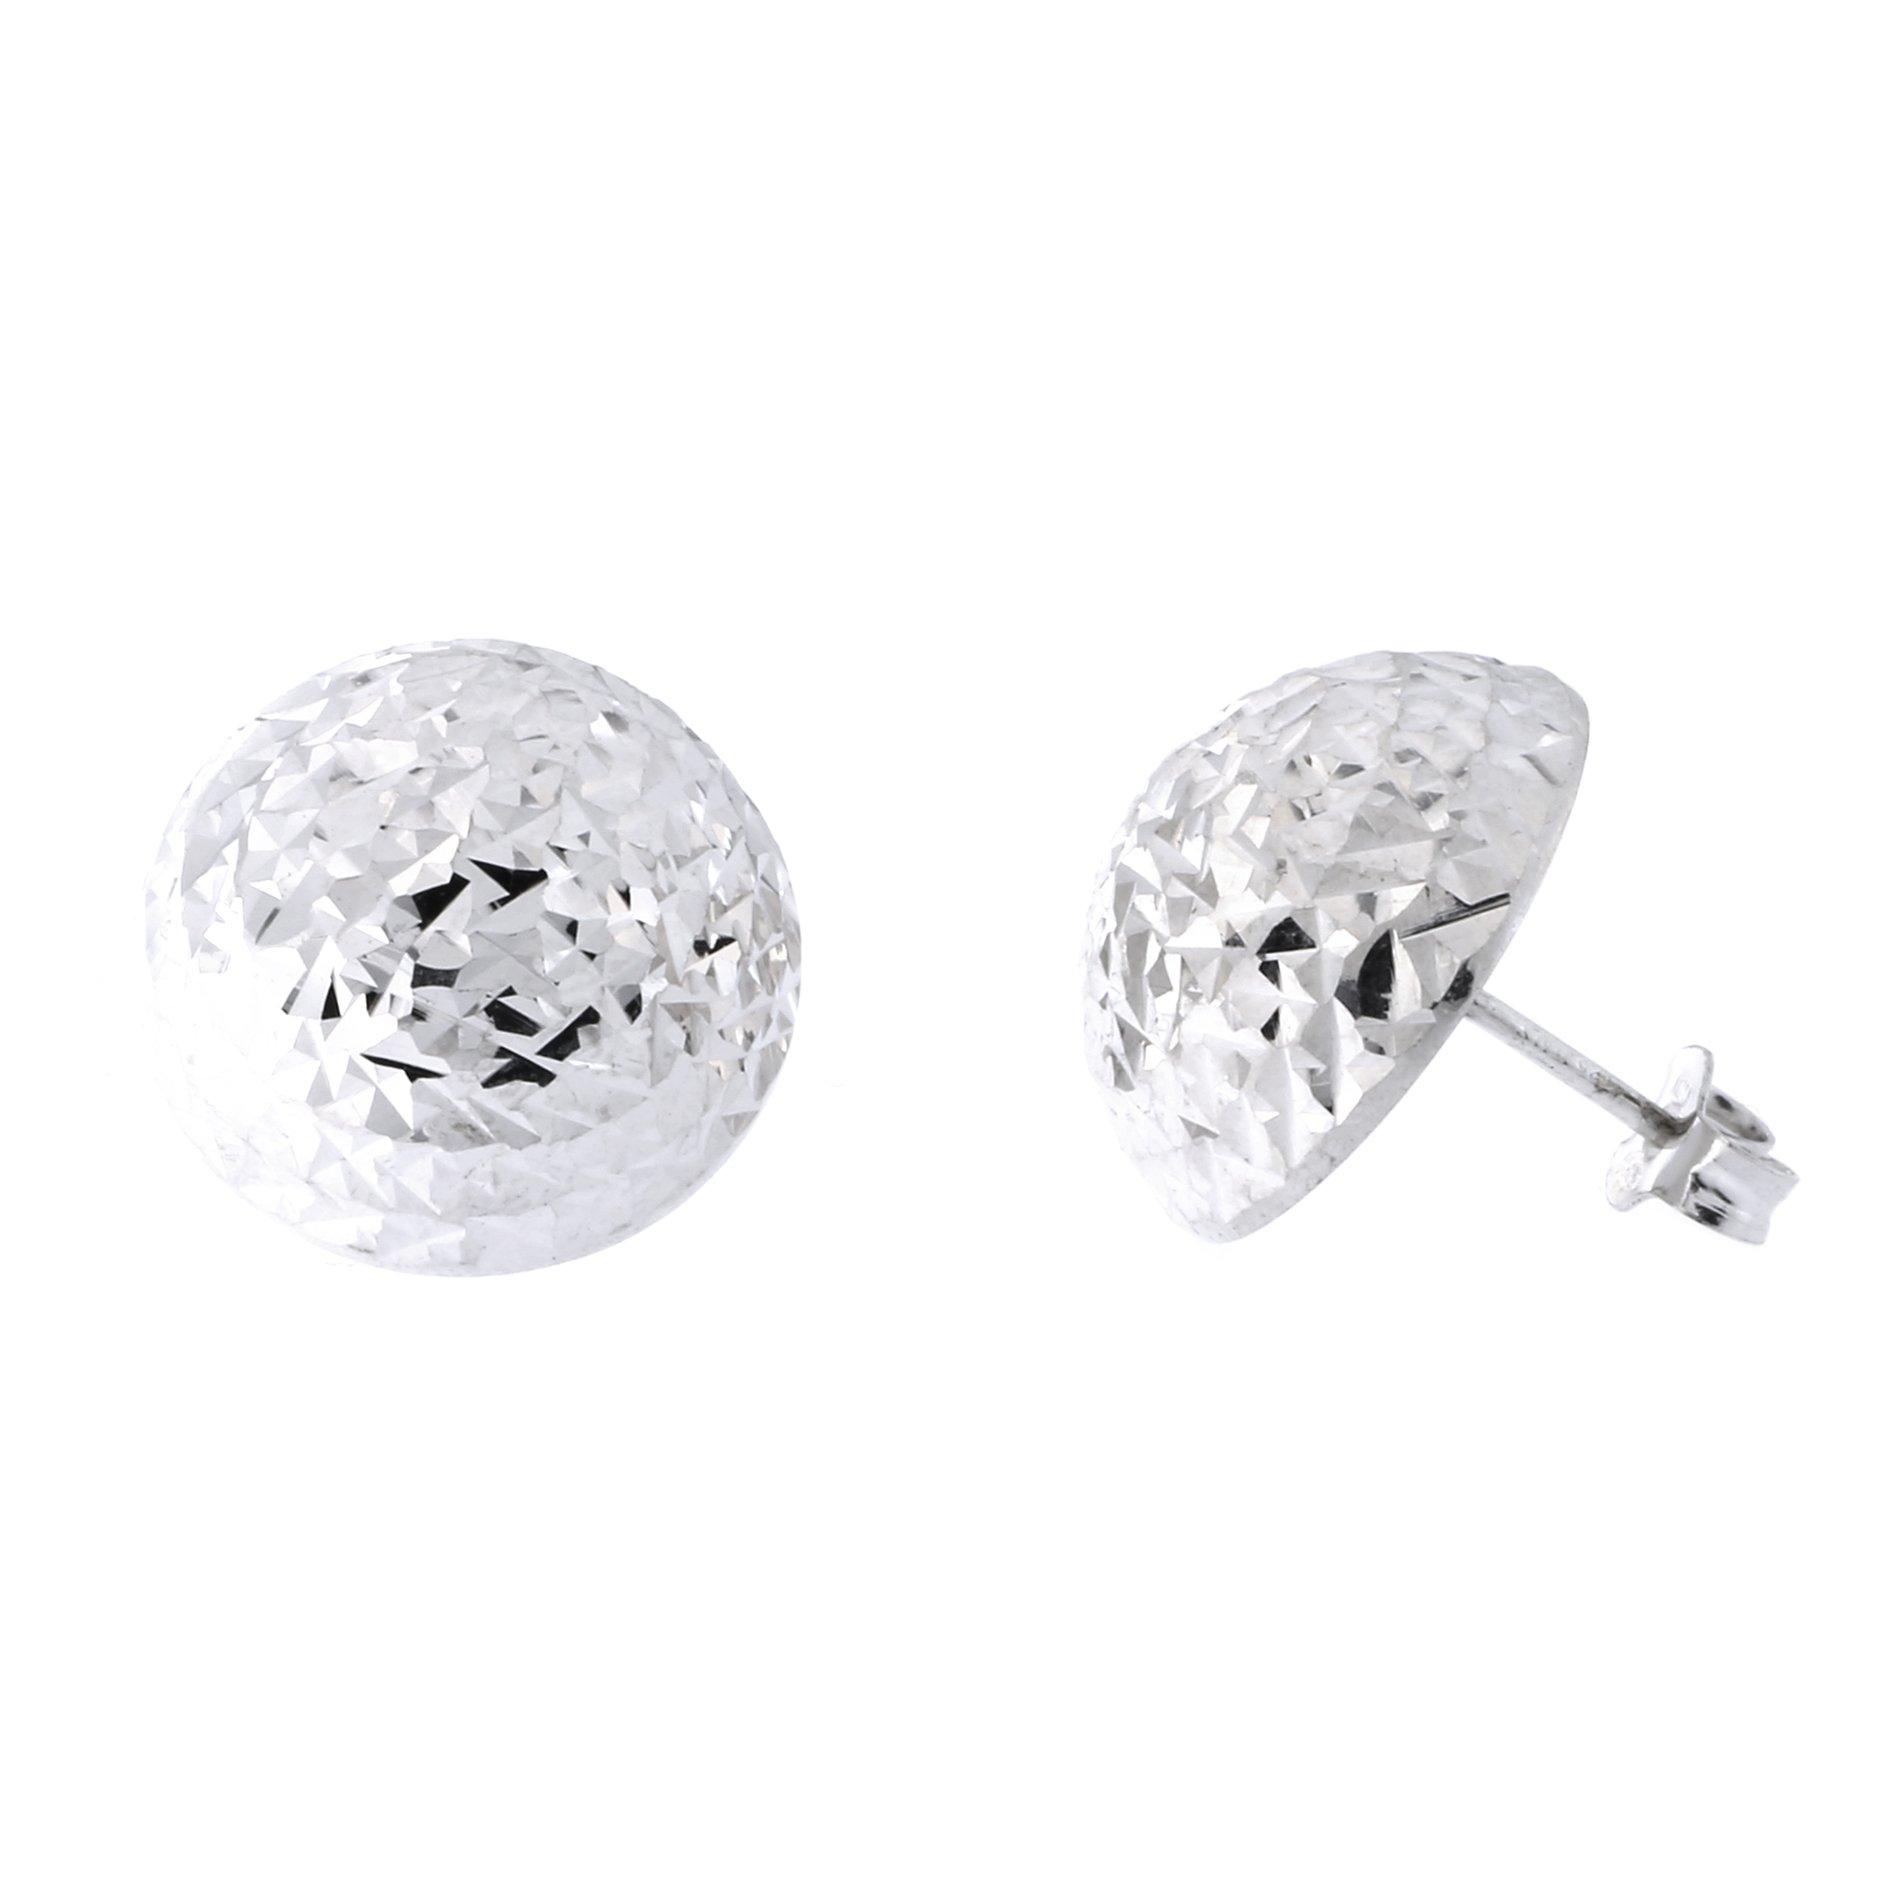 Italian Sterling Silver Rhodium Plated Diamond Cut Half Ball Stud Earrings, 16mm (5/8 in)